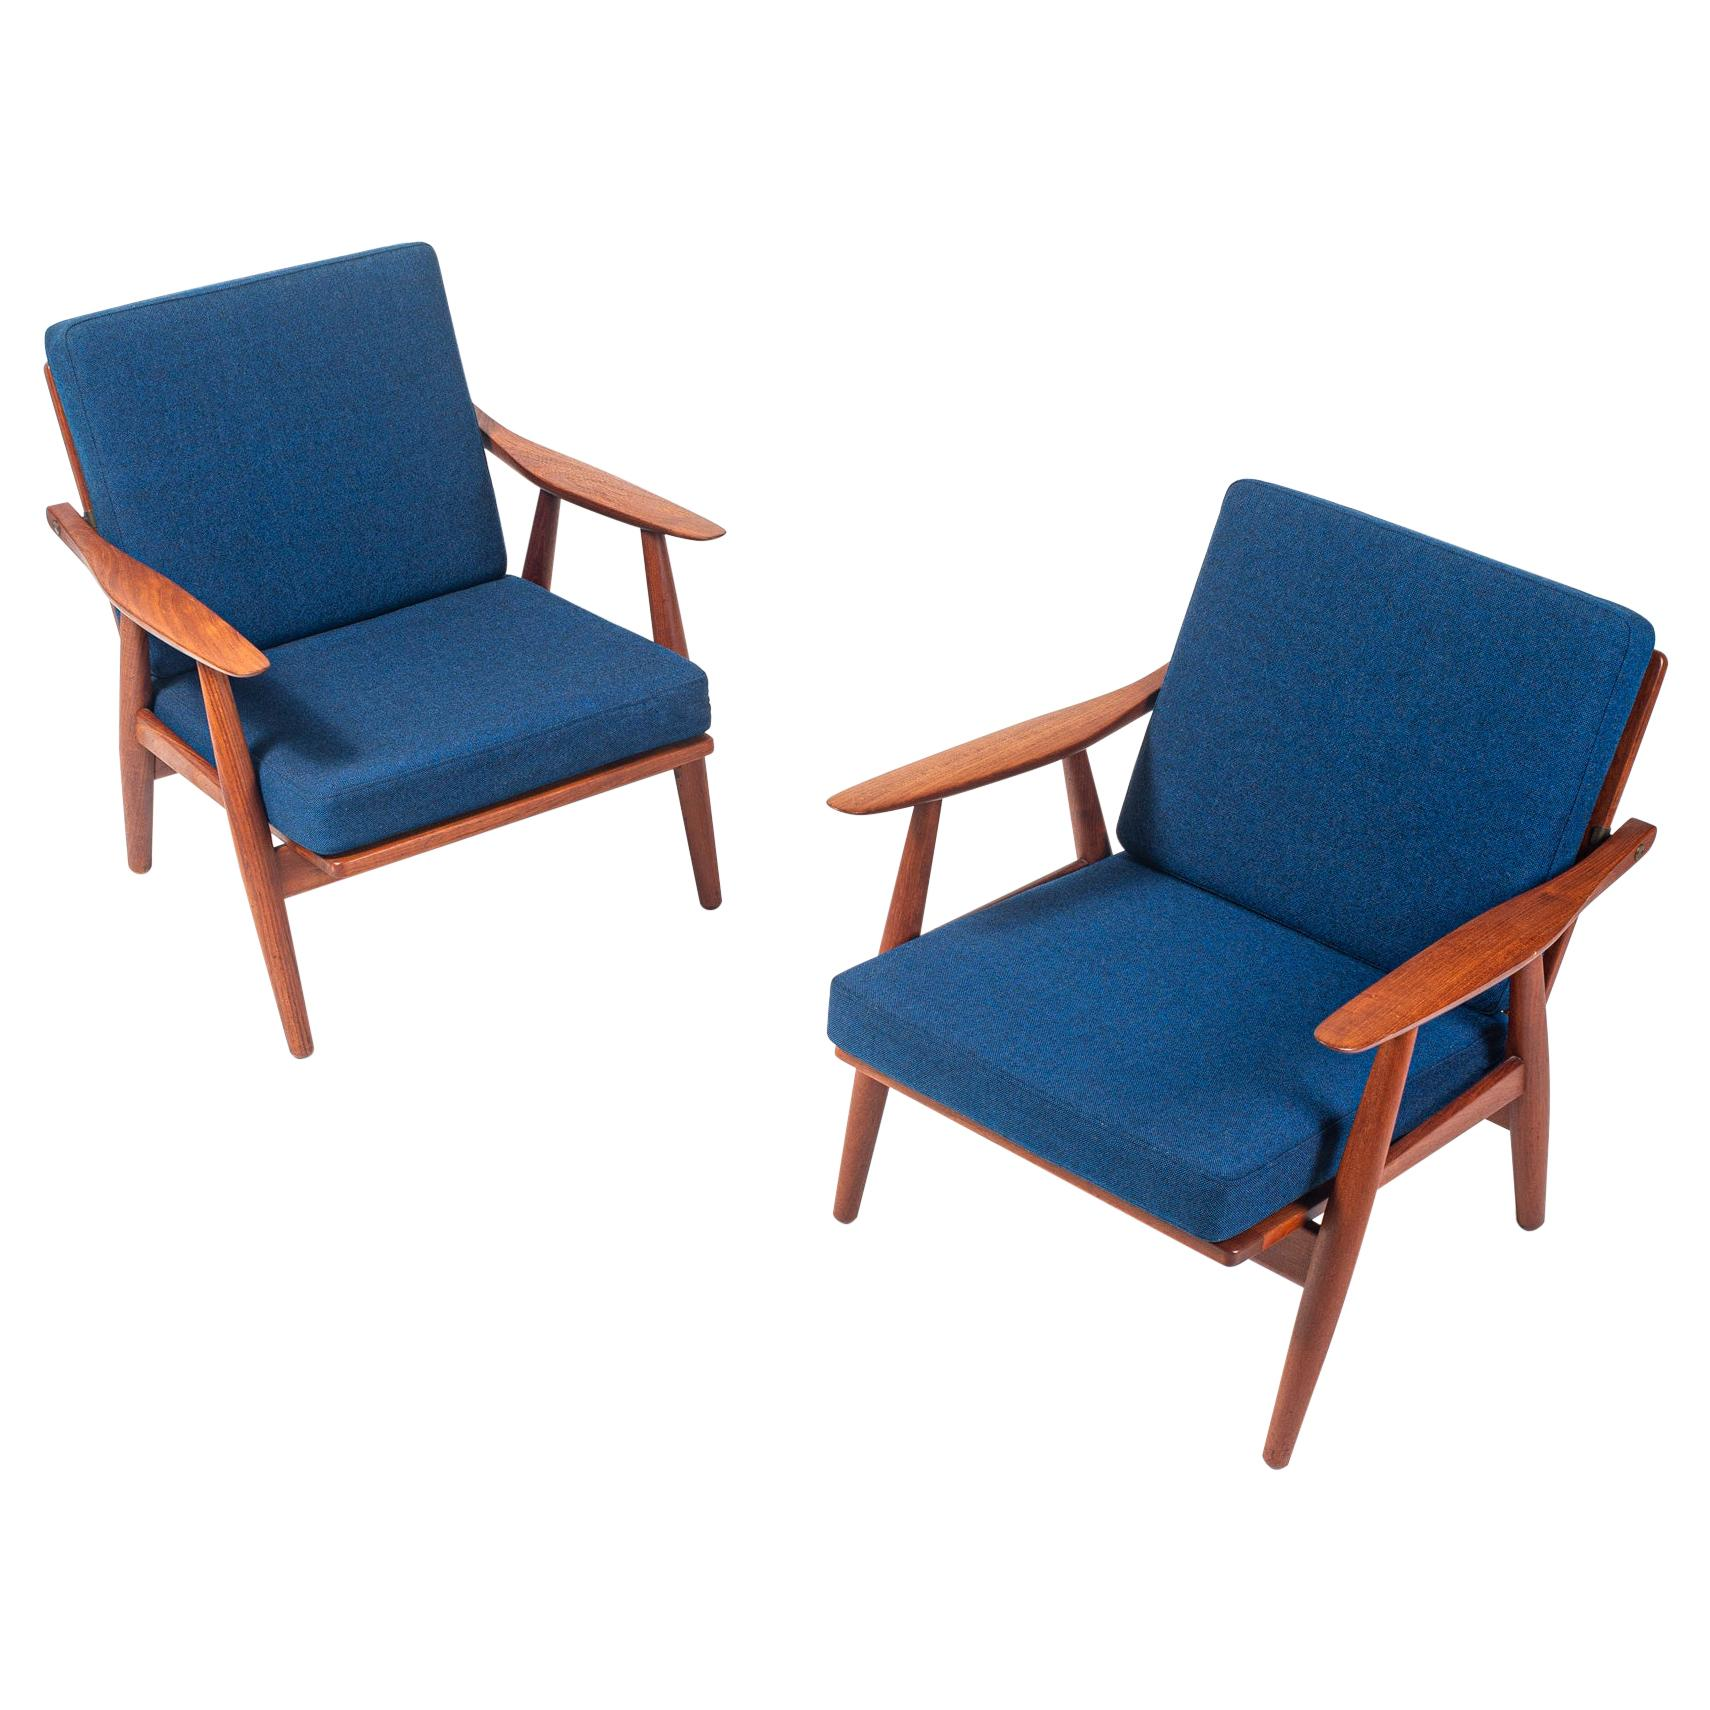 Wegner GE-270 Lounge Chairs